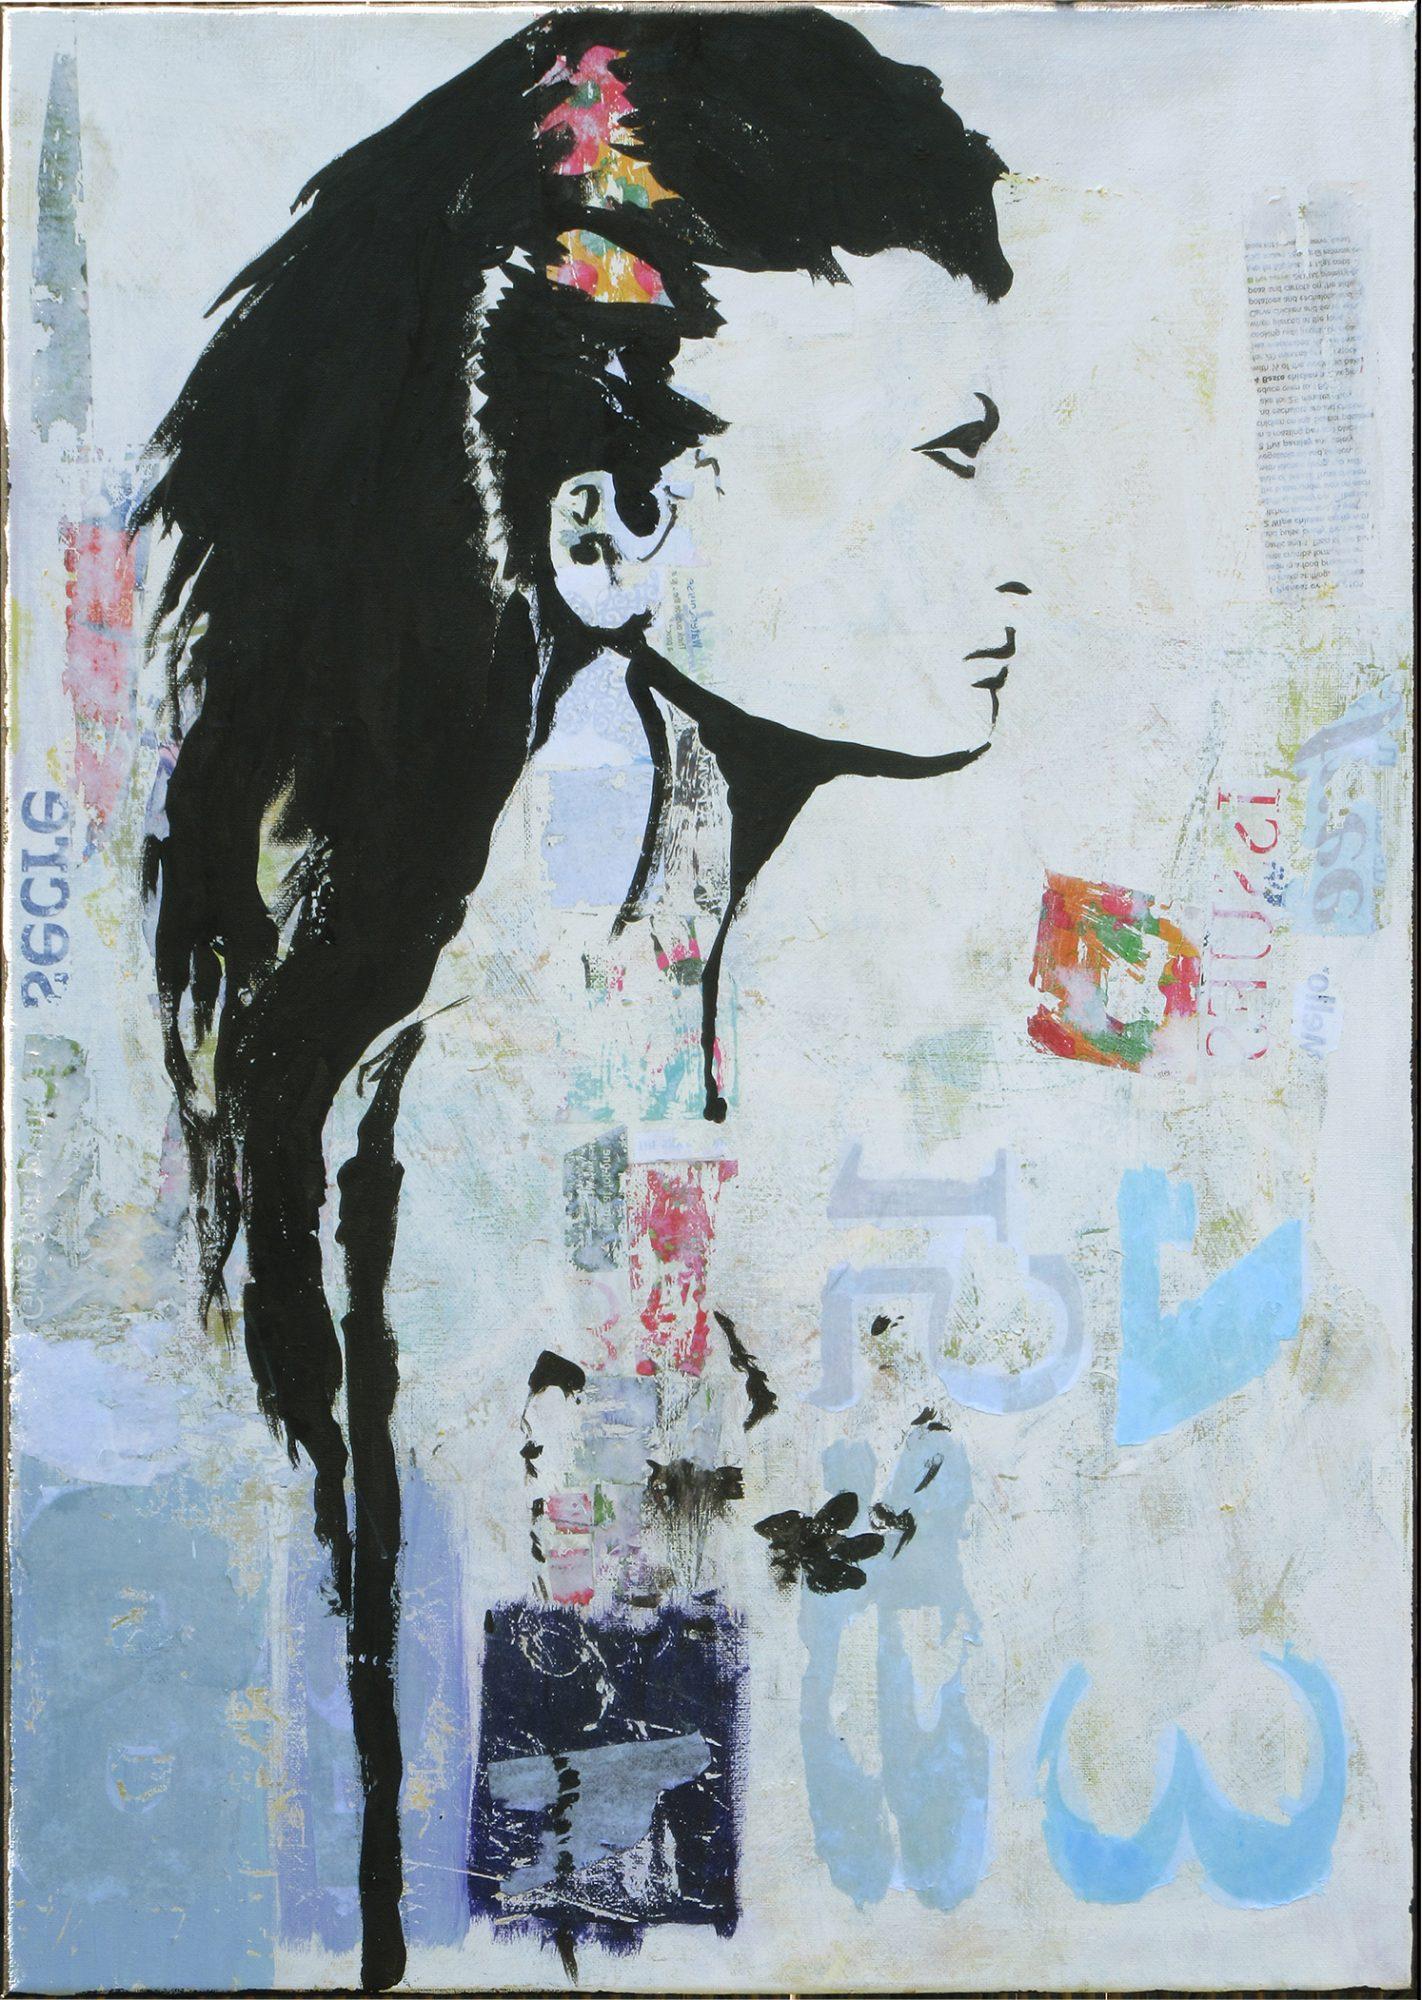 Siouxi